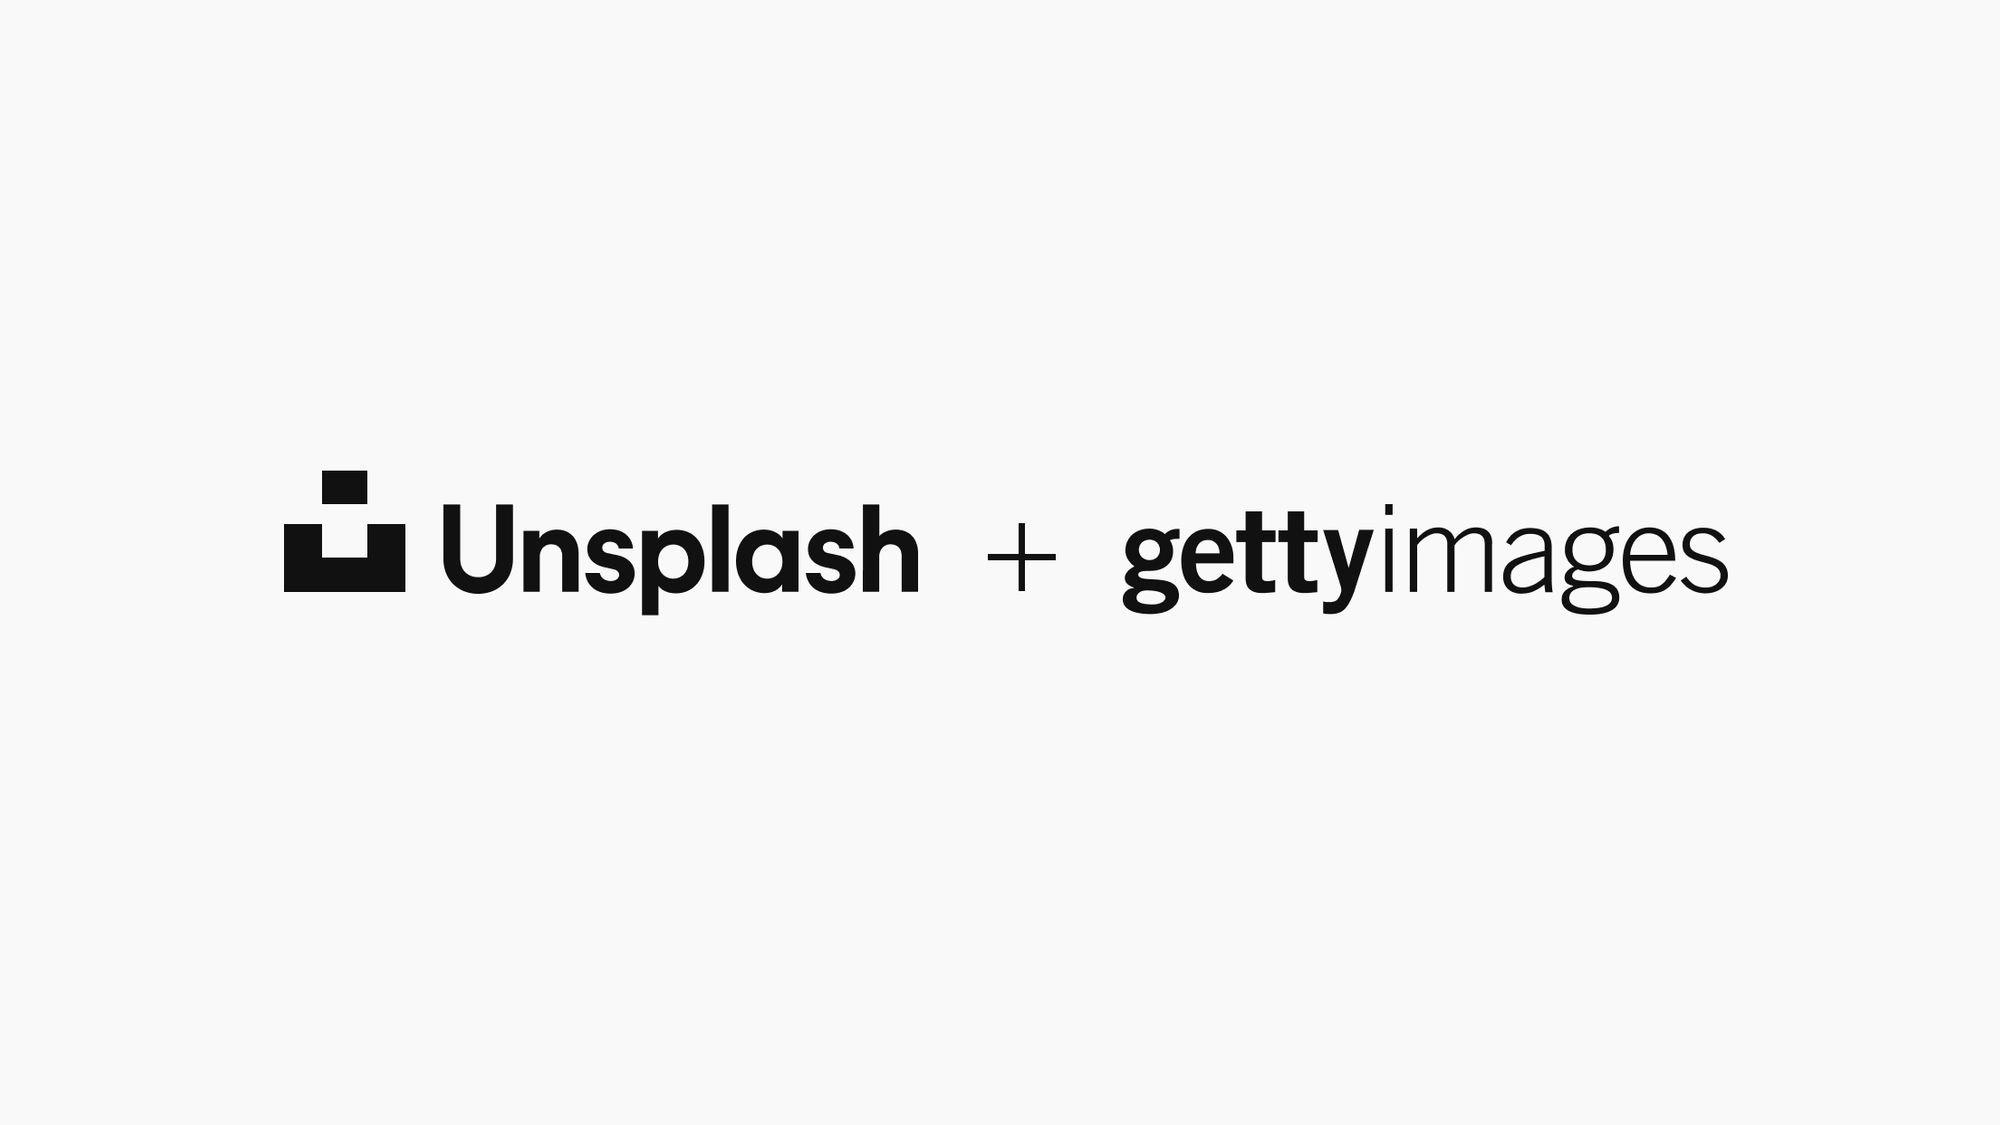 Unsplash getty images